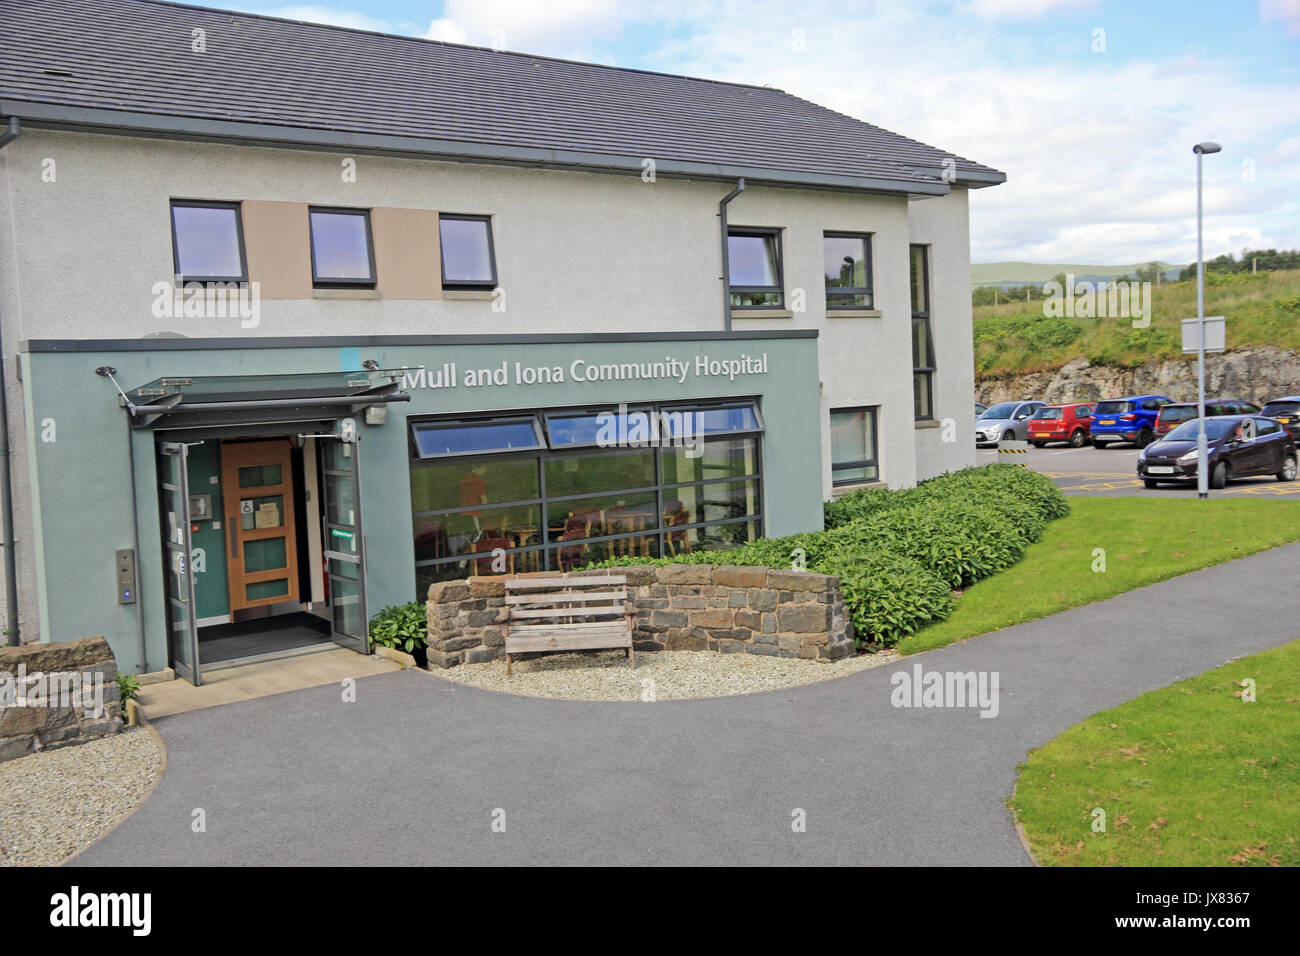 Mull and Iona Community Hospital, Craignure, Isle of Mull - Stock Image